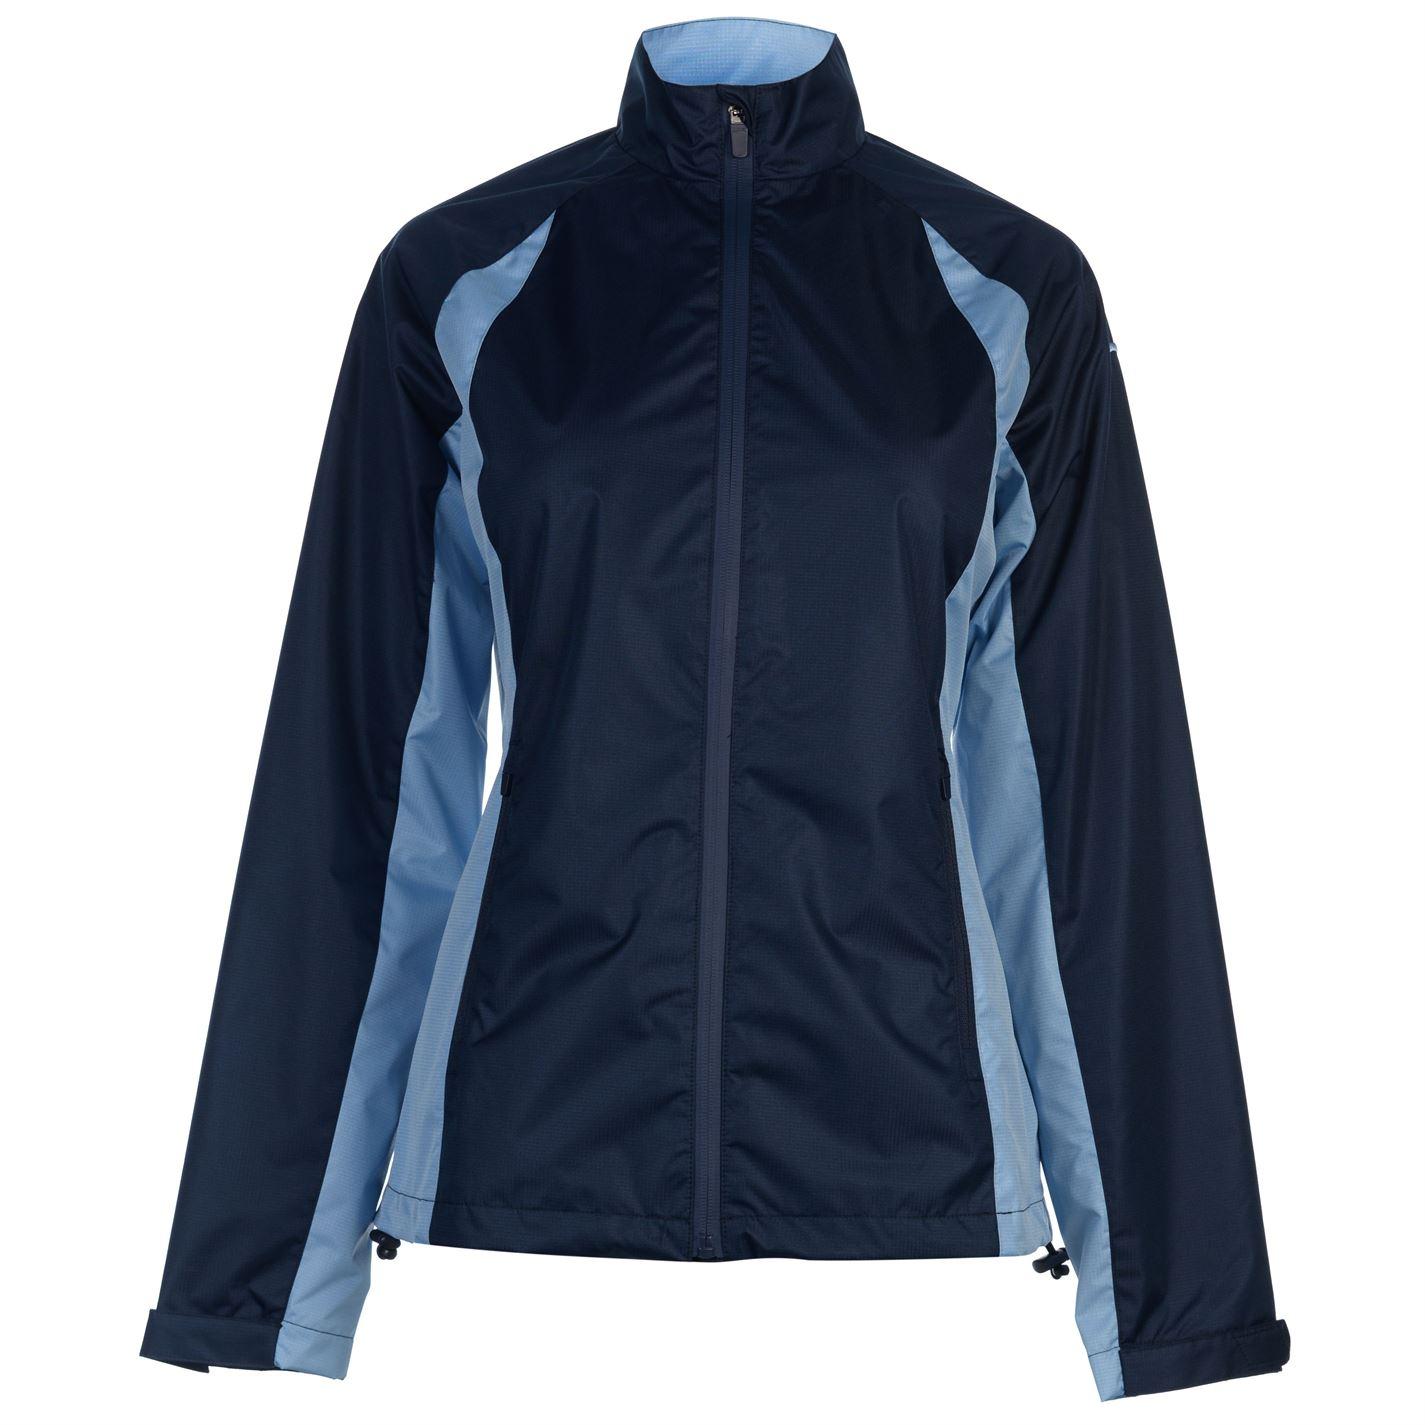 Slazenger Water Resistant Jacket Ladies